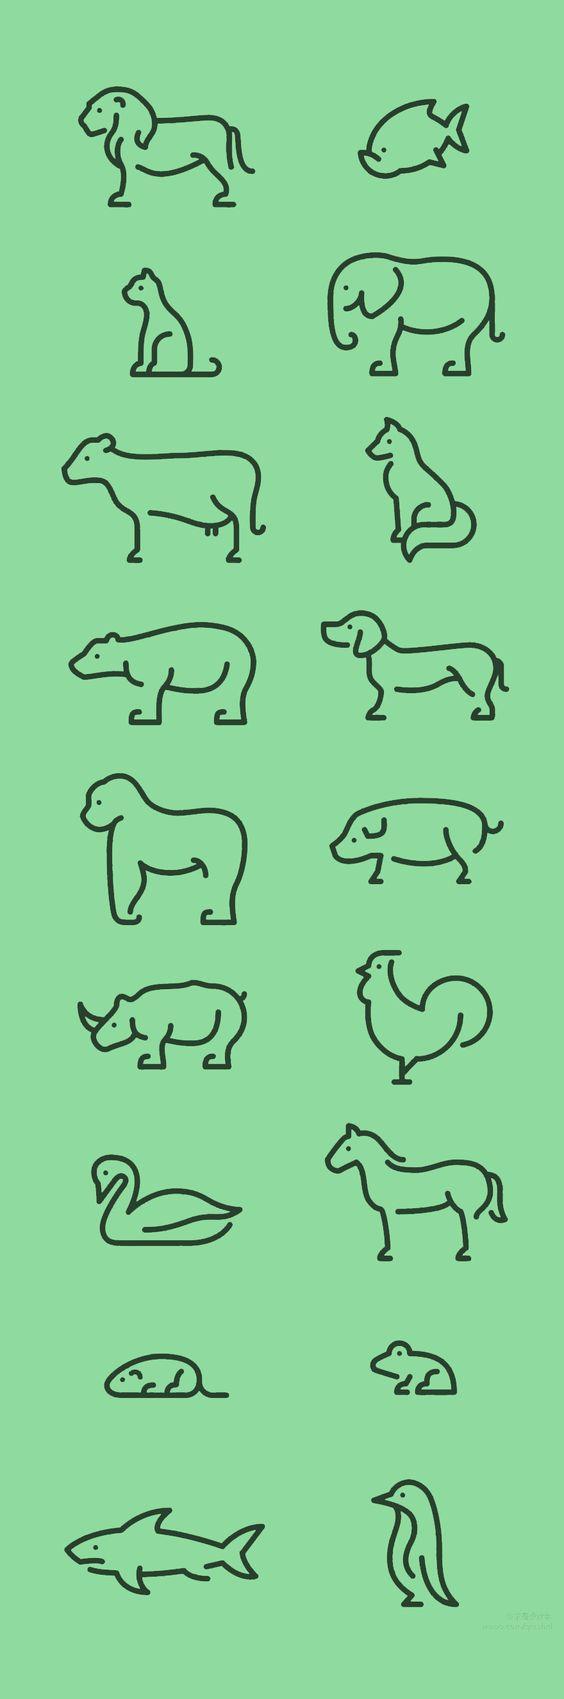 One Line Drawings Of Animals : Animals little tattoo idea tatoos pinterest